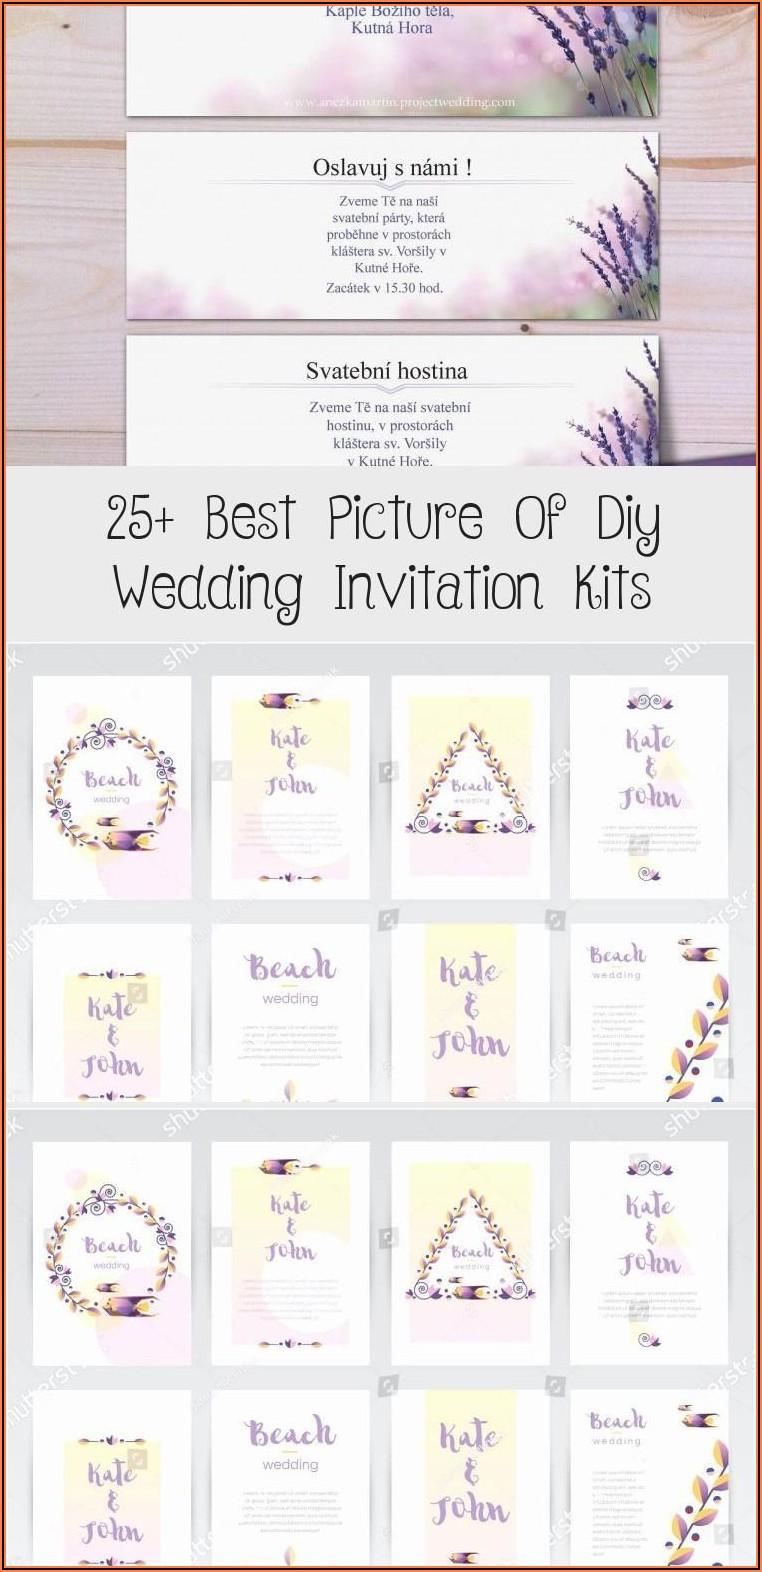 Diy Wedding Invitations Kits Cheap